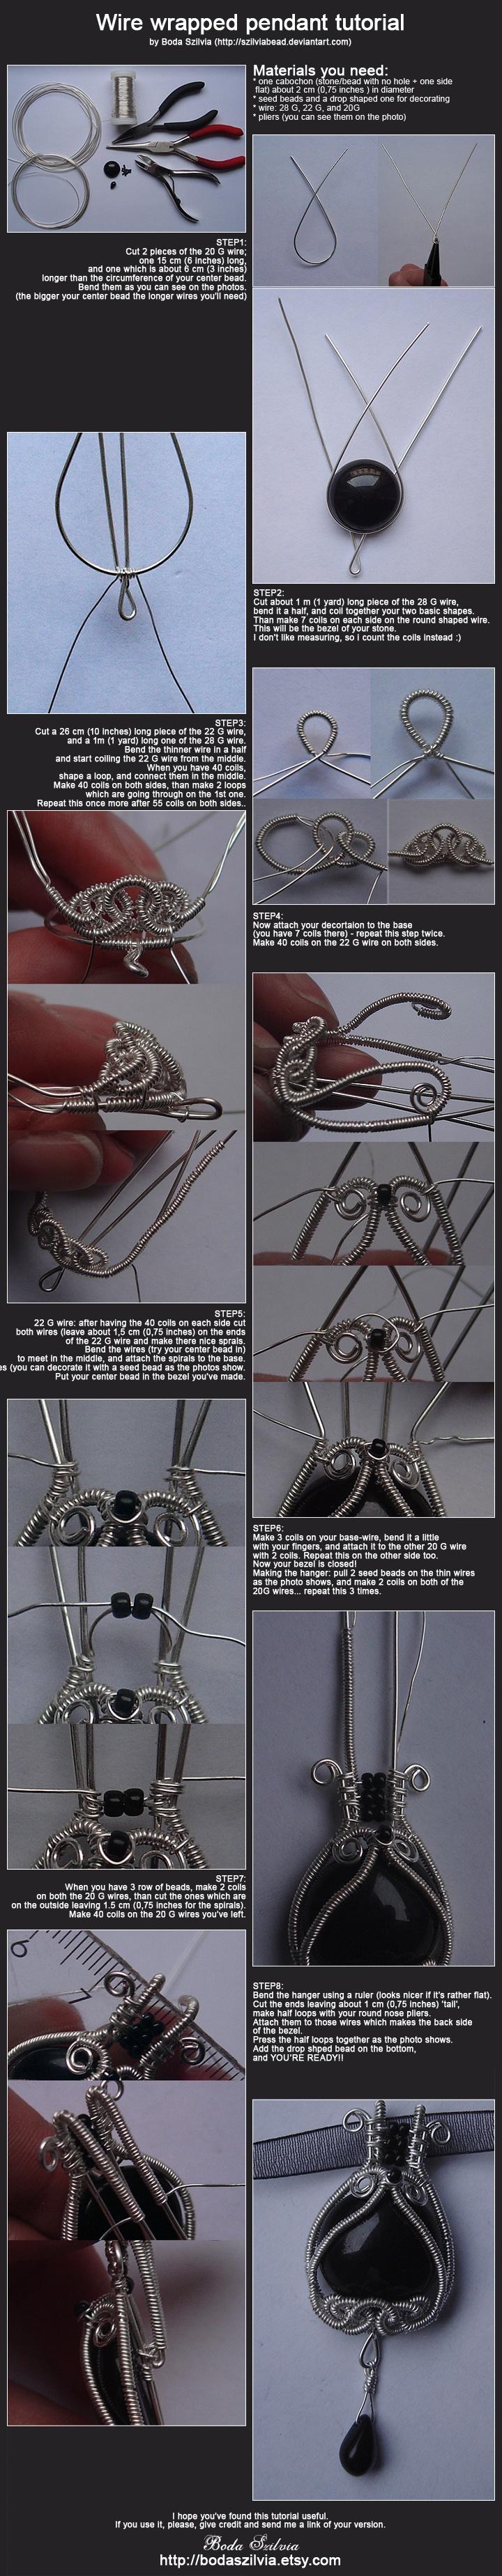 Wire Wrapped Pendant Tutorial by Boda Szilvia (http://szilviabead.deviantart.com)